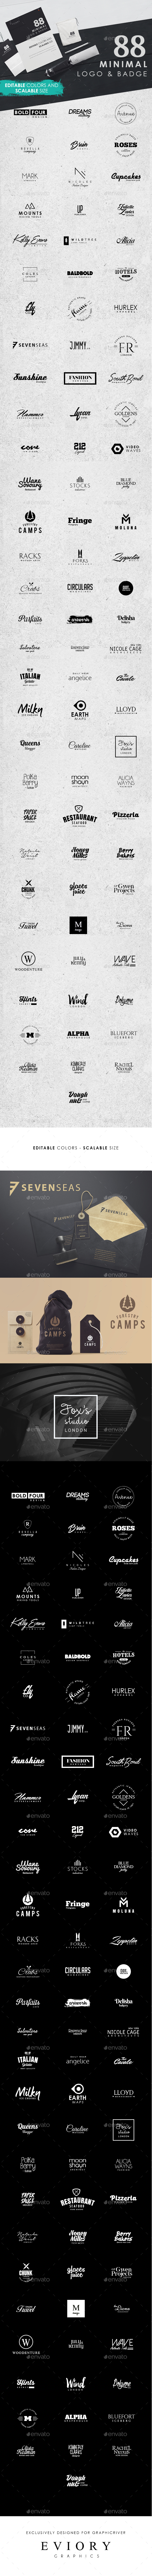 88 Minimal Logo and Badge - Badges & Stickers Web Elements